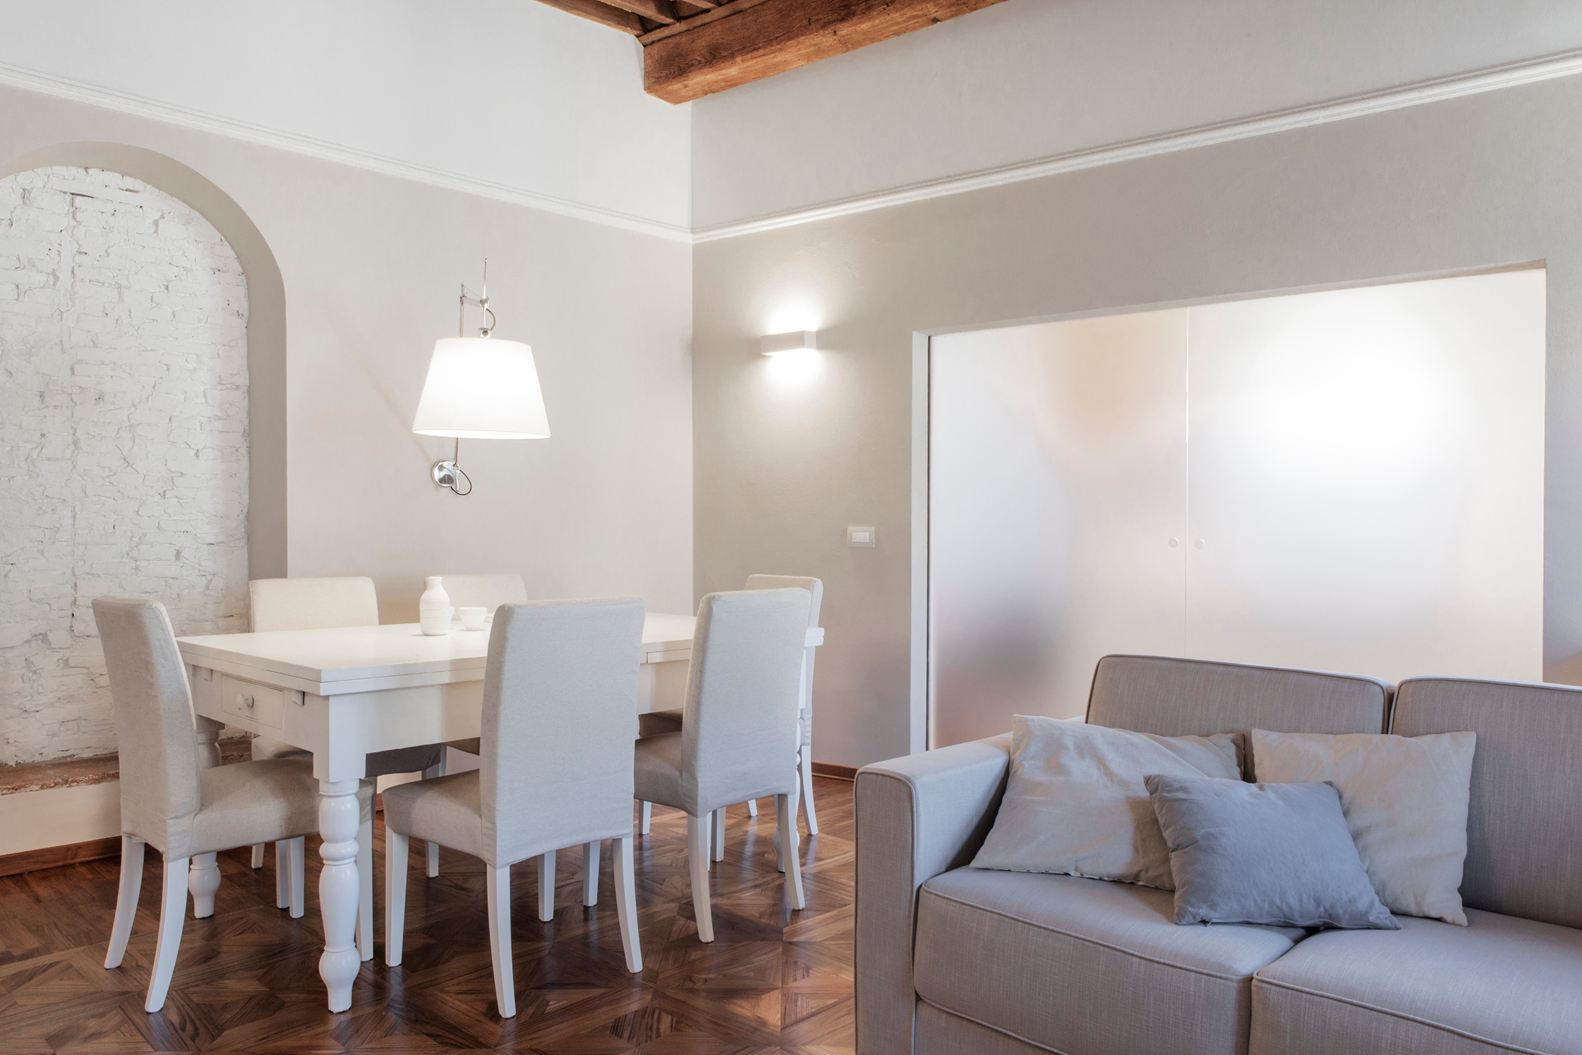 Binomio legno-bianco per una mansarda a Lucca - Mansarda.it